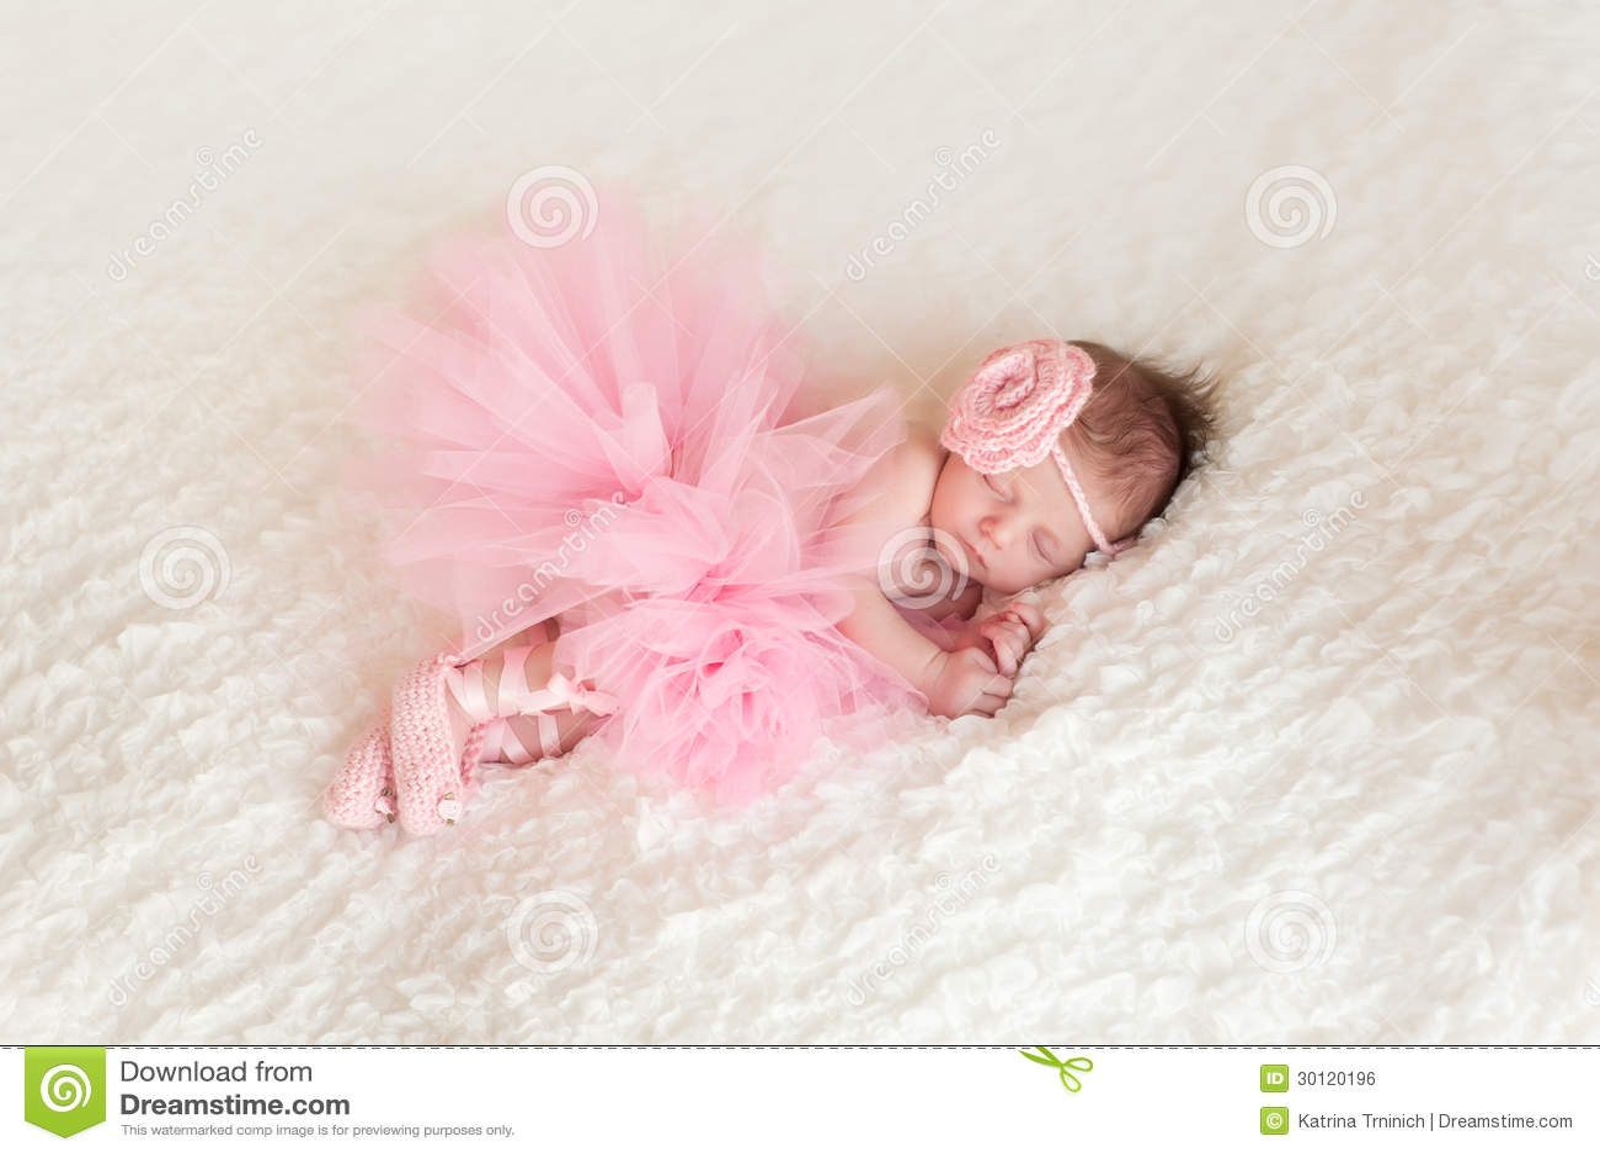 2e9aa628ec Newborn baby girl wearing a pink crocheted headband, ballerina tutu, and ballet  slippers. She is sleeping on white billowy fabric.